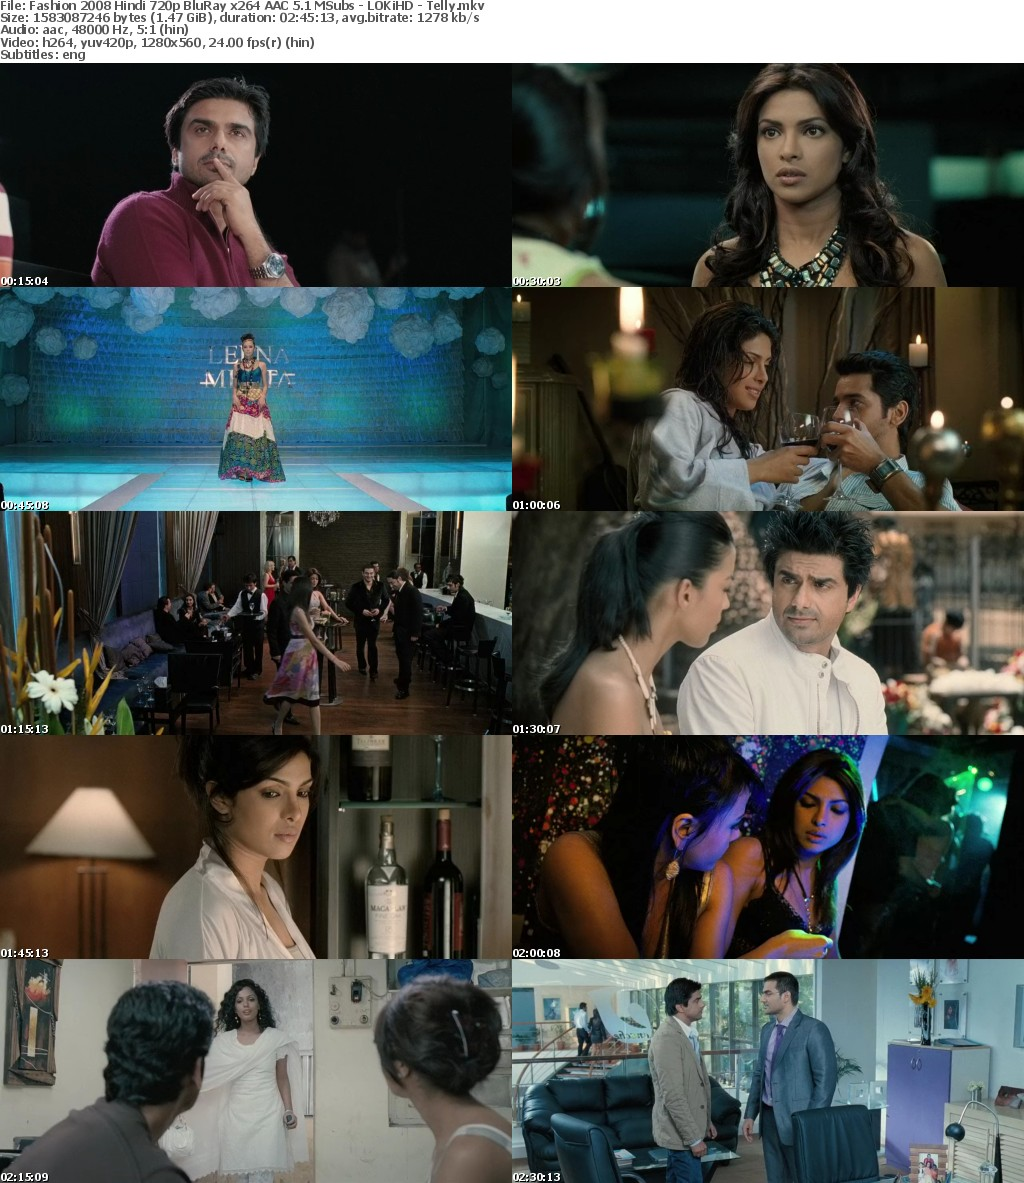 Fashion 2008 Hindi 720p BluRay x264 AAC 5 1 MSubs - LOKiHD - Telly